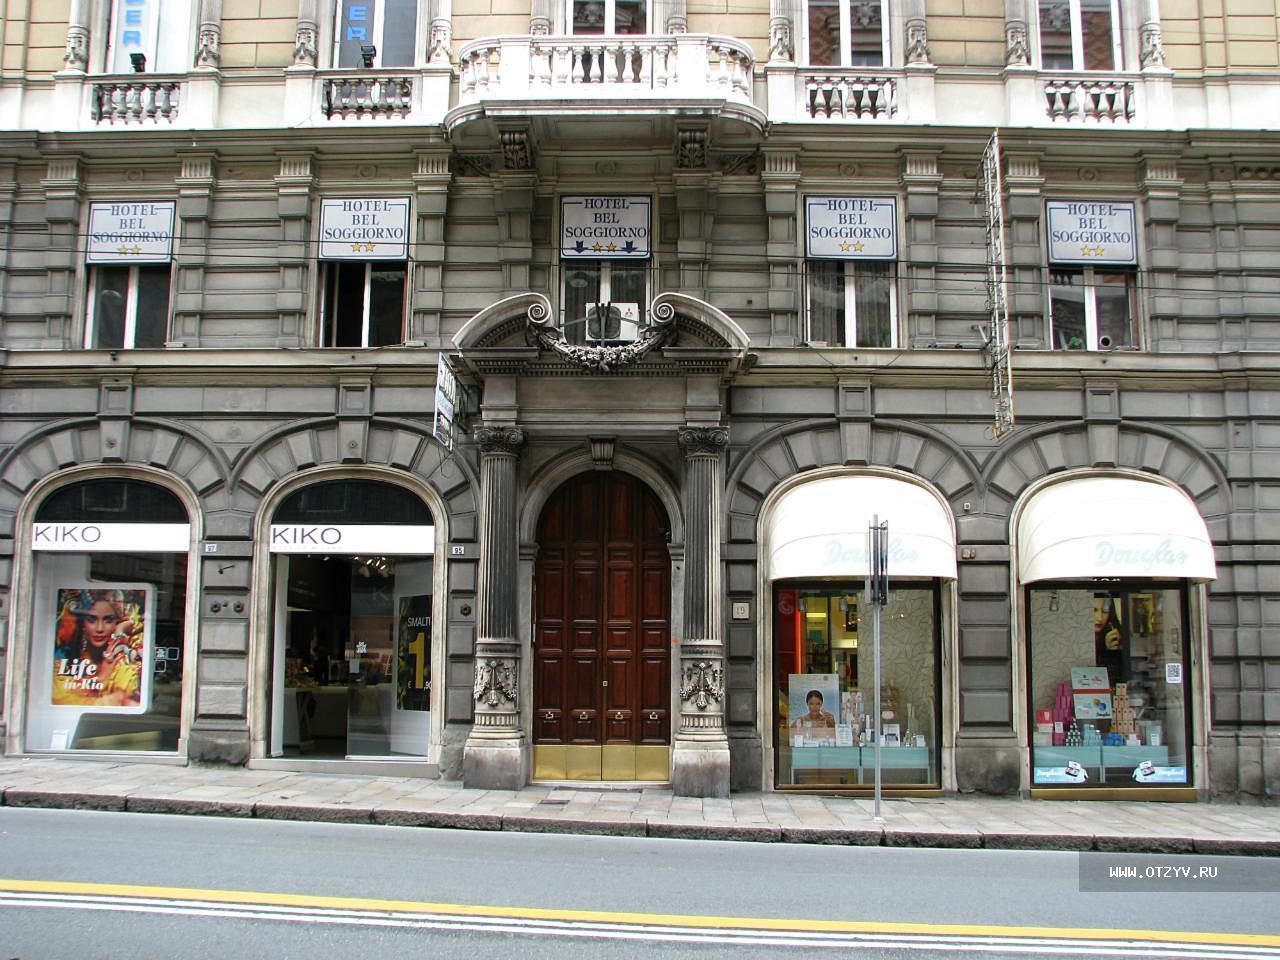 Best Hotel Bel Soggiorno Genova Ideas - Modern Home Design ...